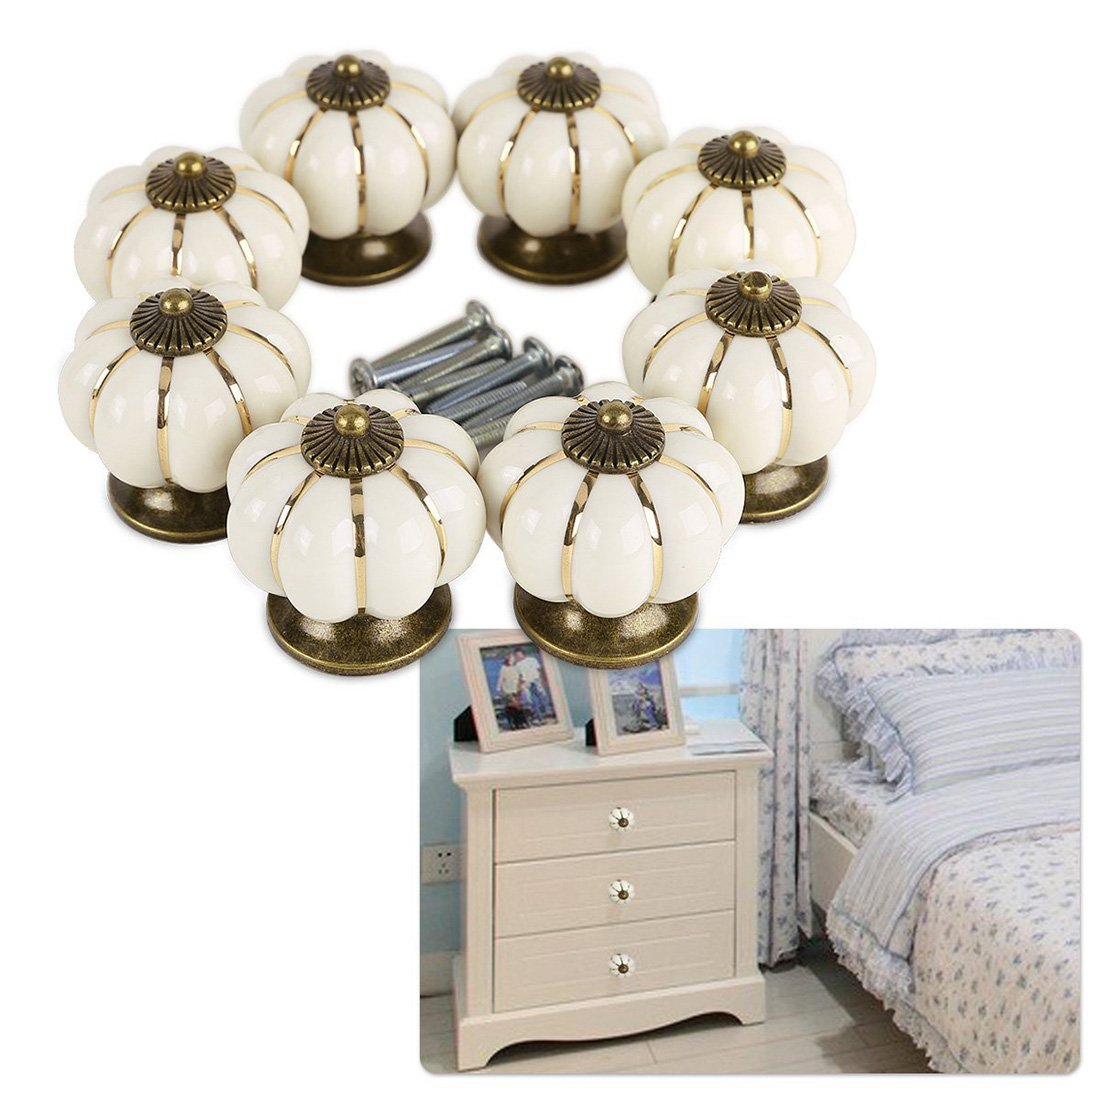 Pumpkin Ceramic Drawer Knobs, YIFAN Set of 10 Cabinet Pulls Dresser Cupboard Door Handles - White 1